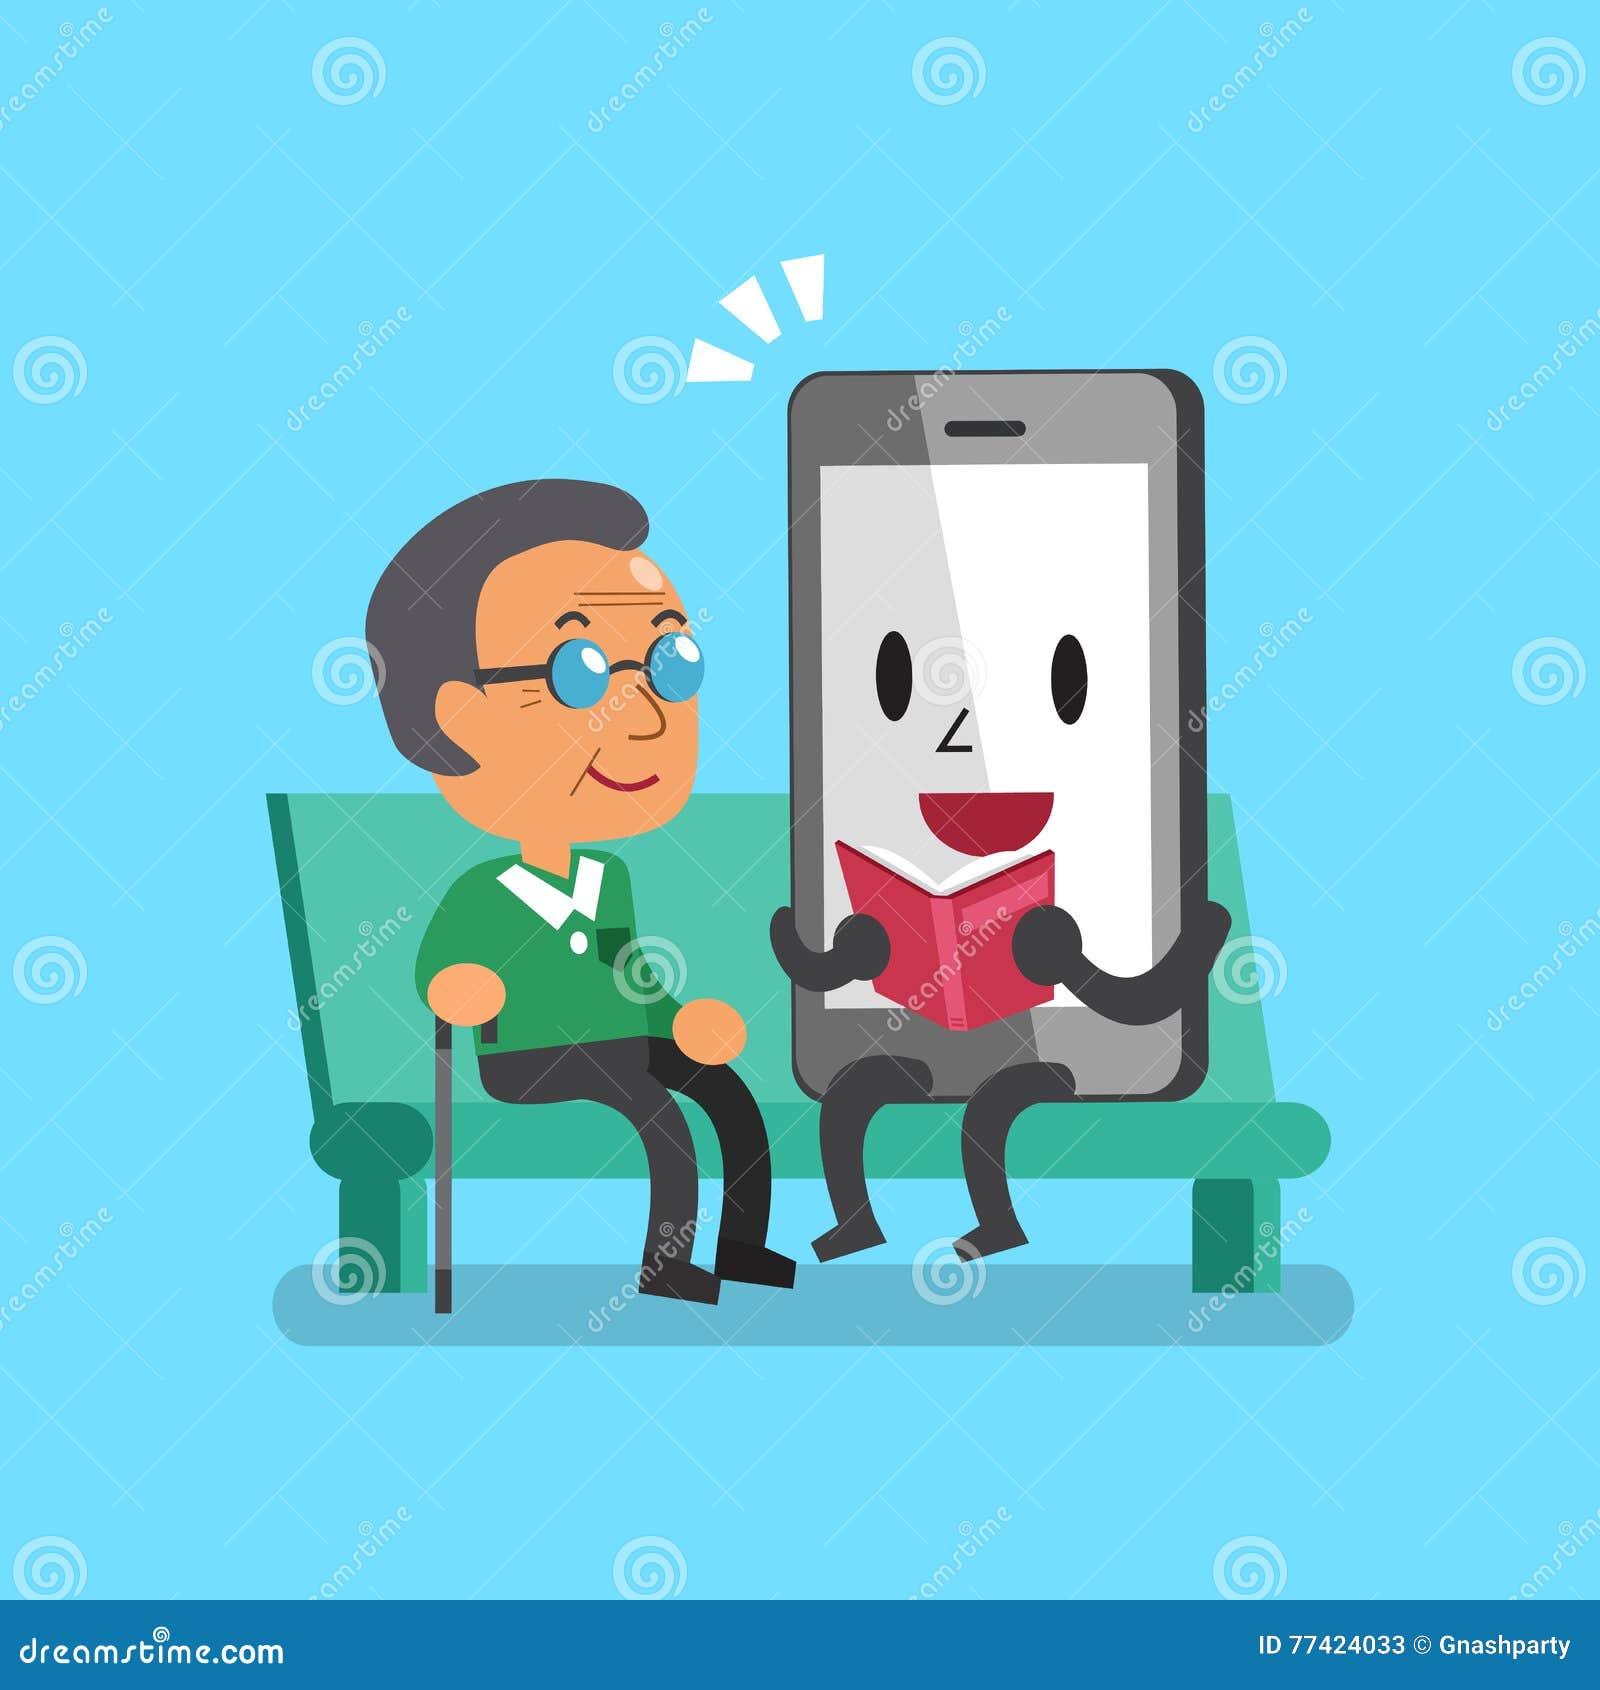 Cartoonsmart Character Design : Cartoon smartphone with senior people vector illustration